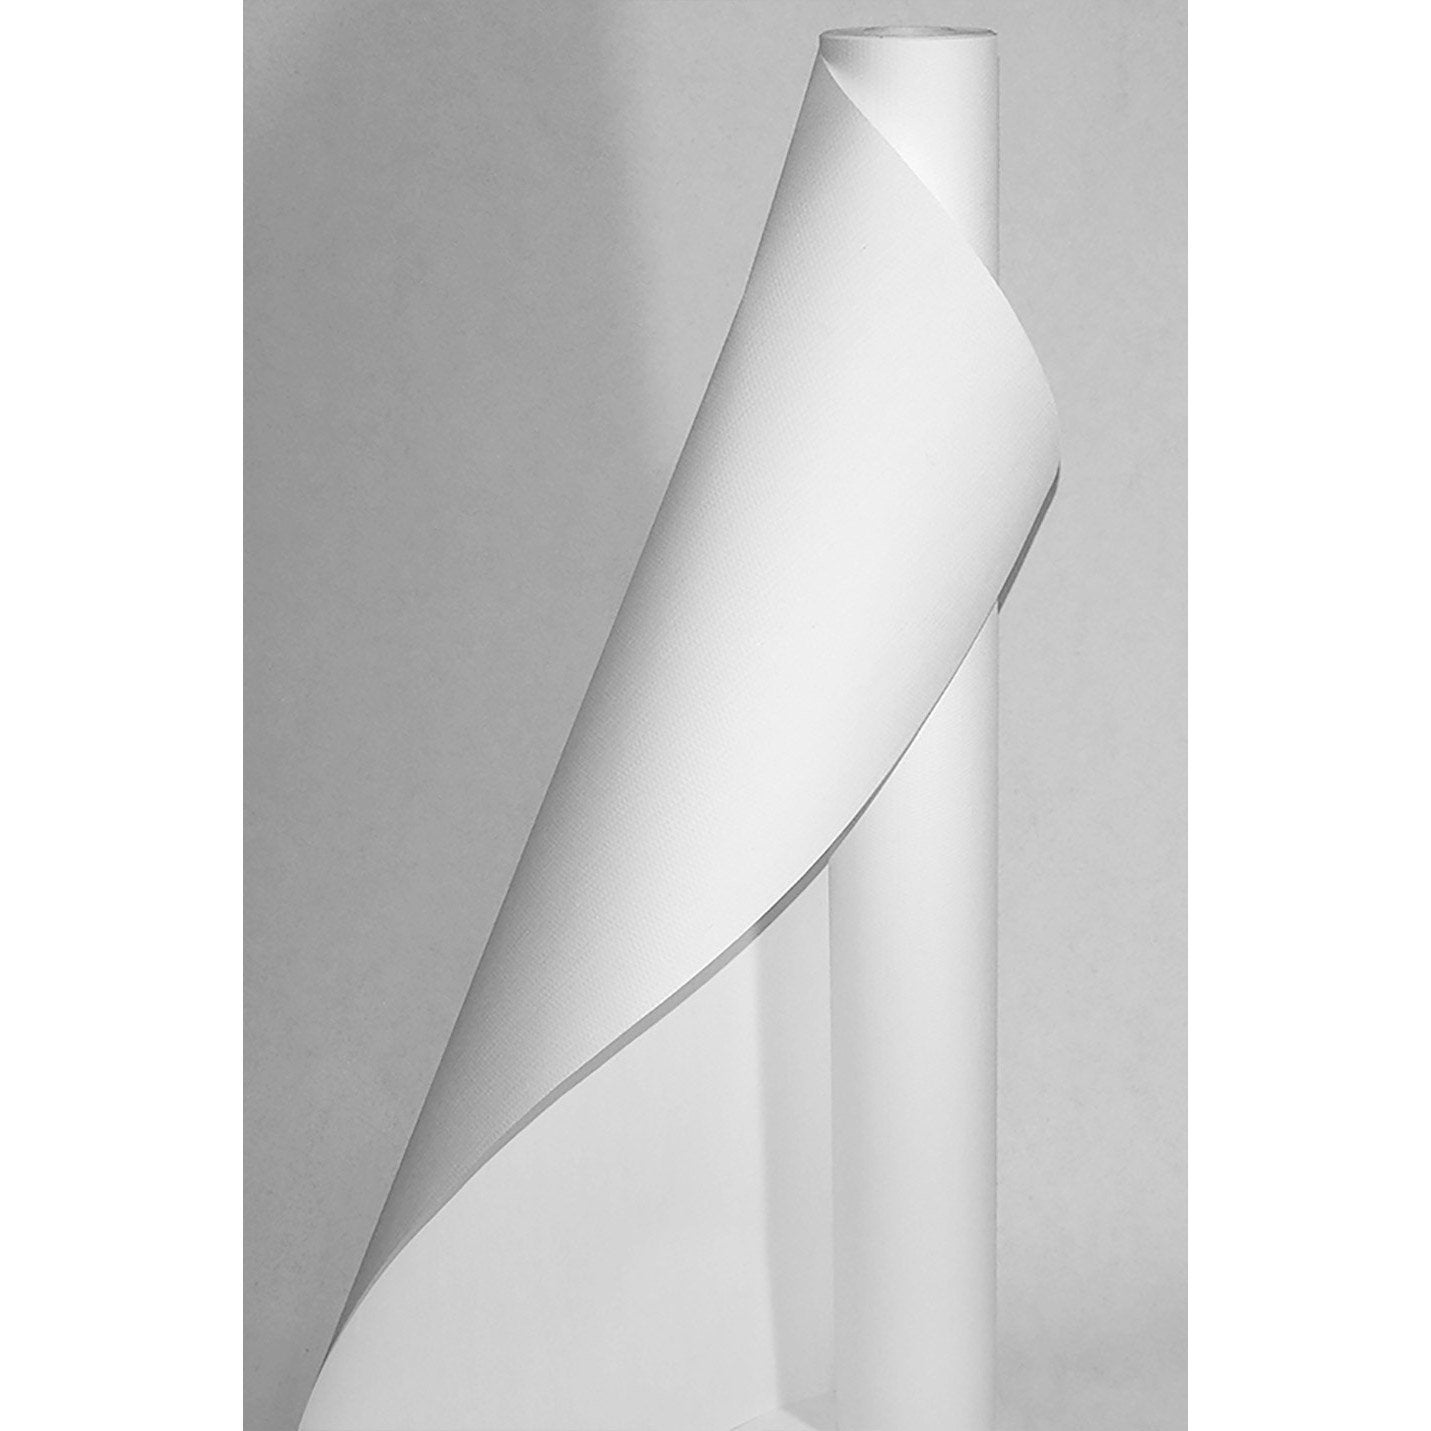 Fibre de verre lanivit maille ultra fine pr peinte pr peint 130 g m leroy merlin - Mur fibre de verre ...